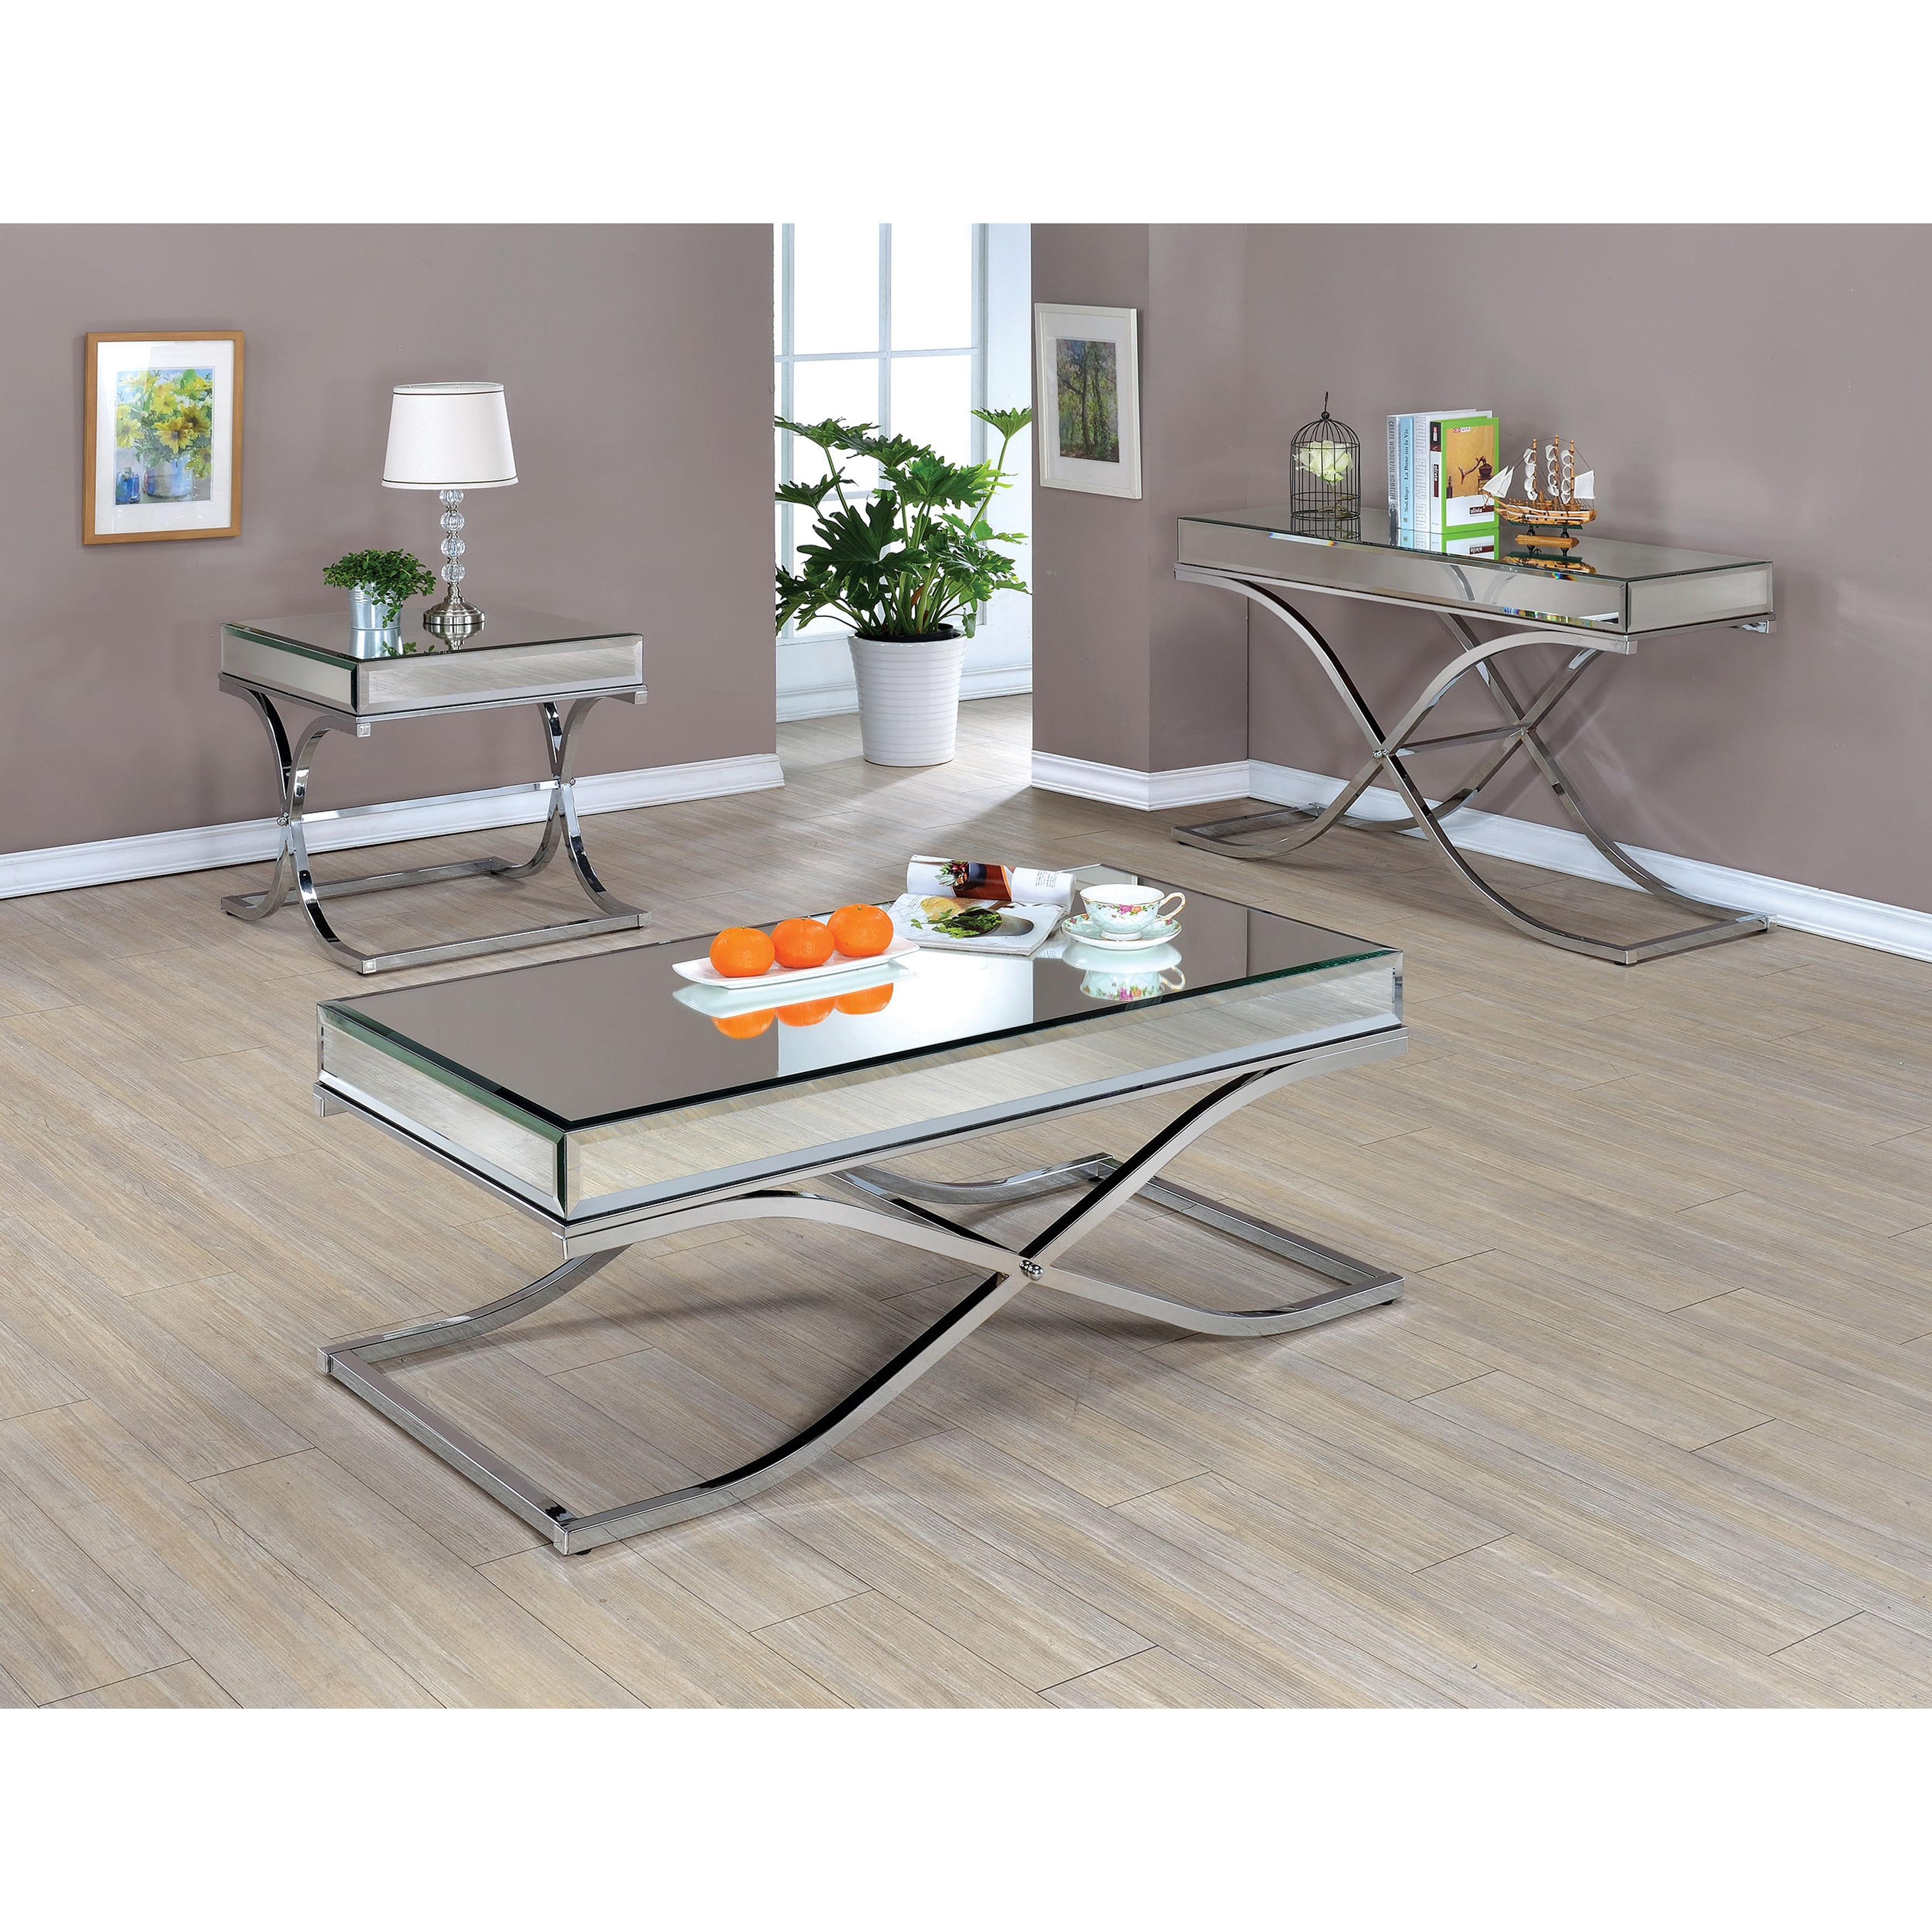 Furniture Of America Laja Contemporary